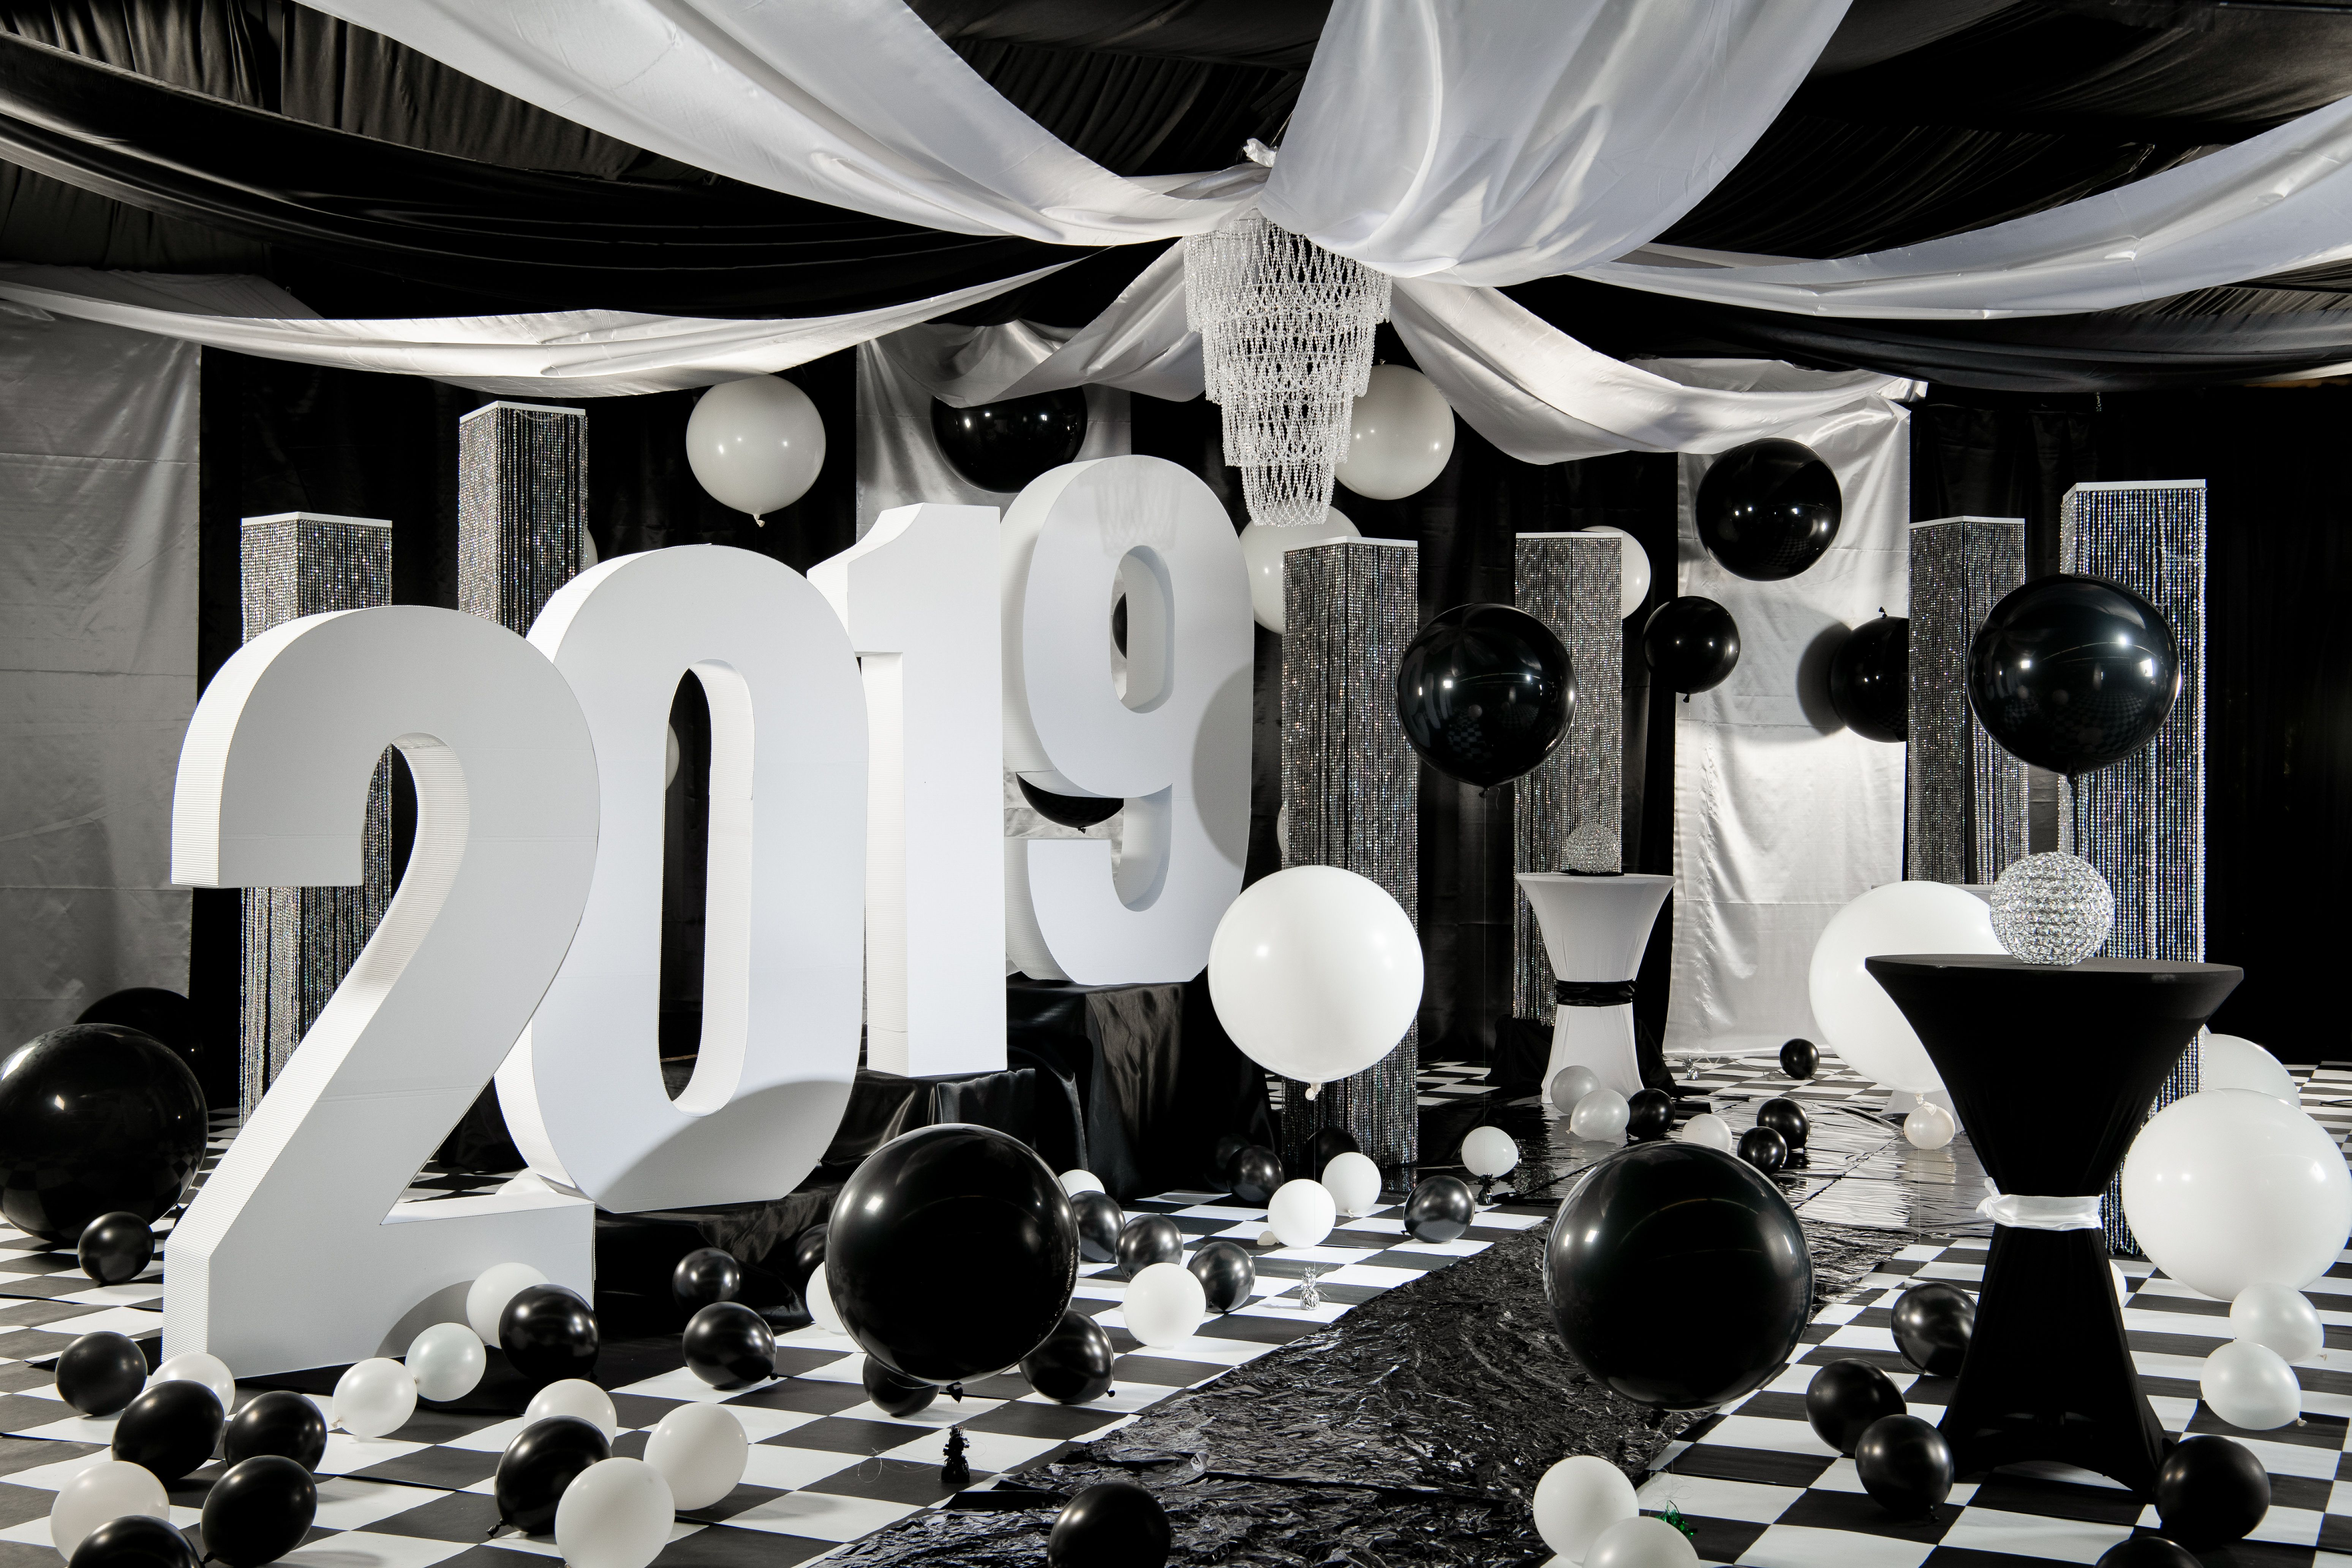 Black White Ball Theme For Prom 2019 White Cocktail Tables